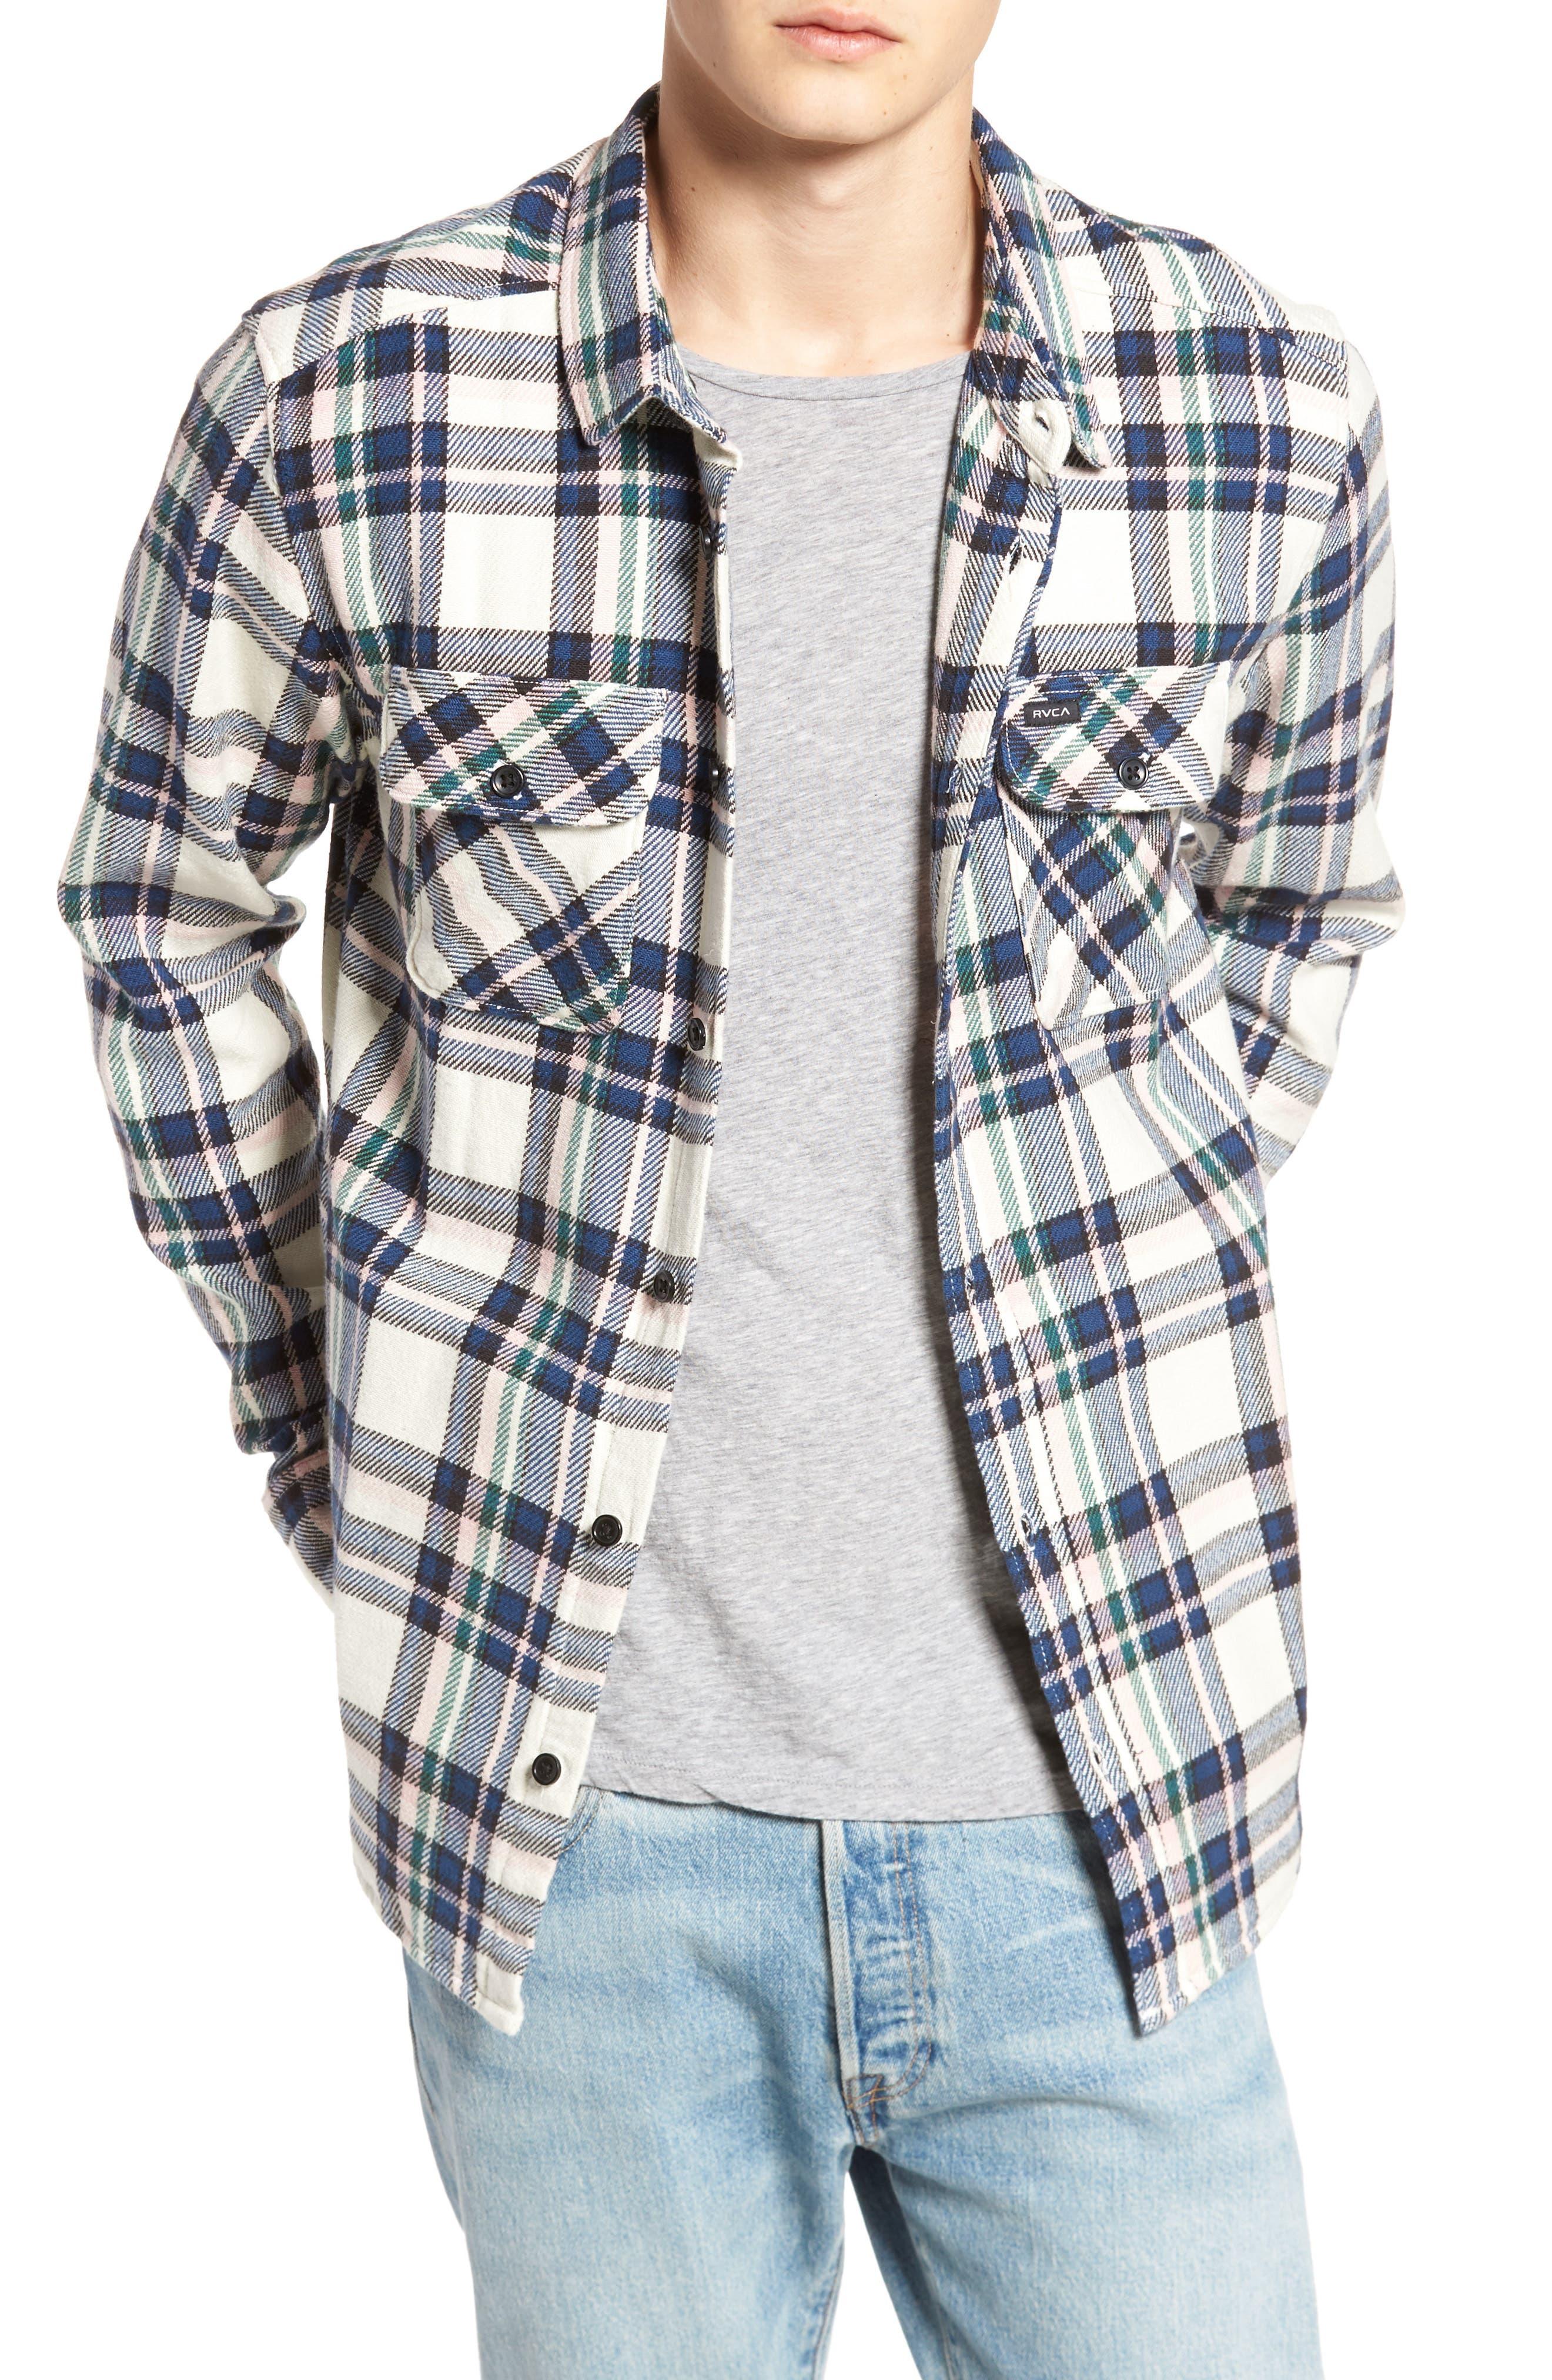 Camino Flannel Shirt,                             Main thumbnail 1, color,                             Multi Beige